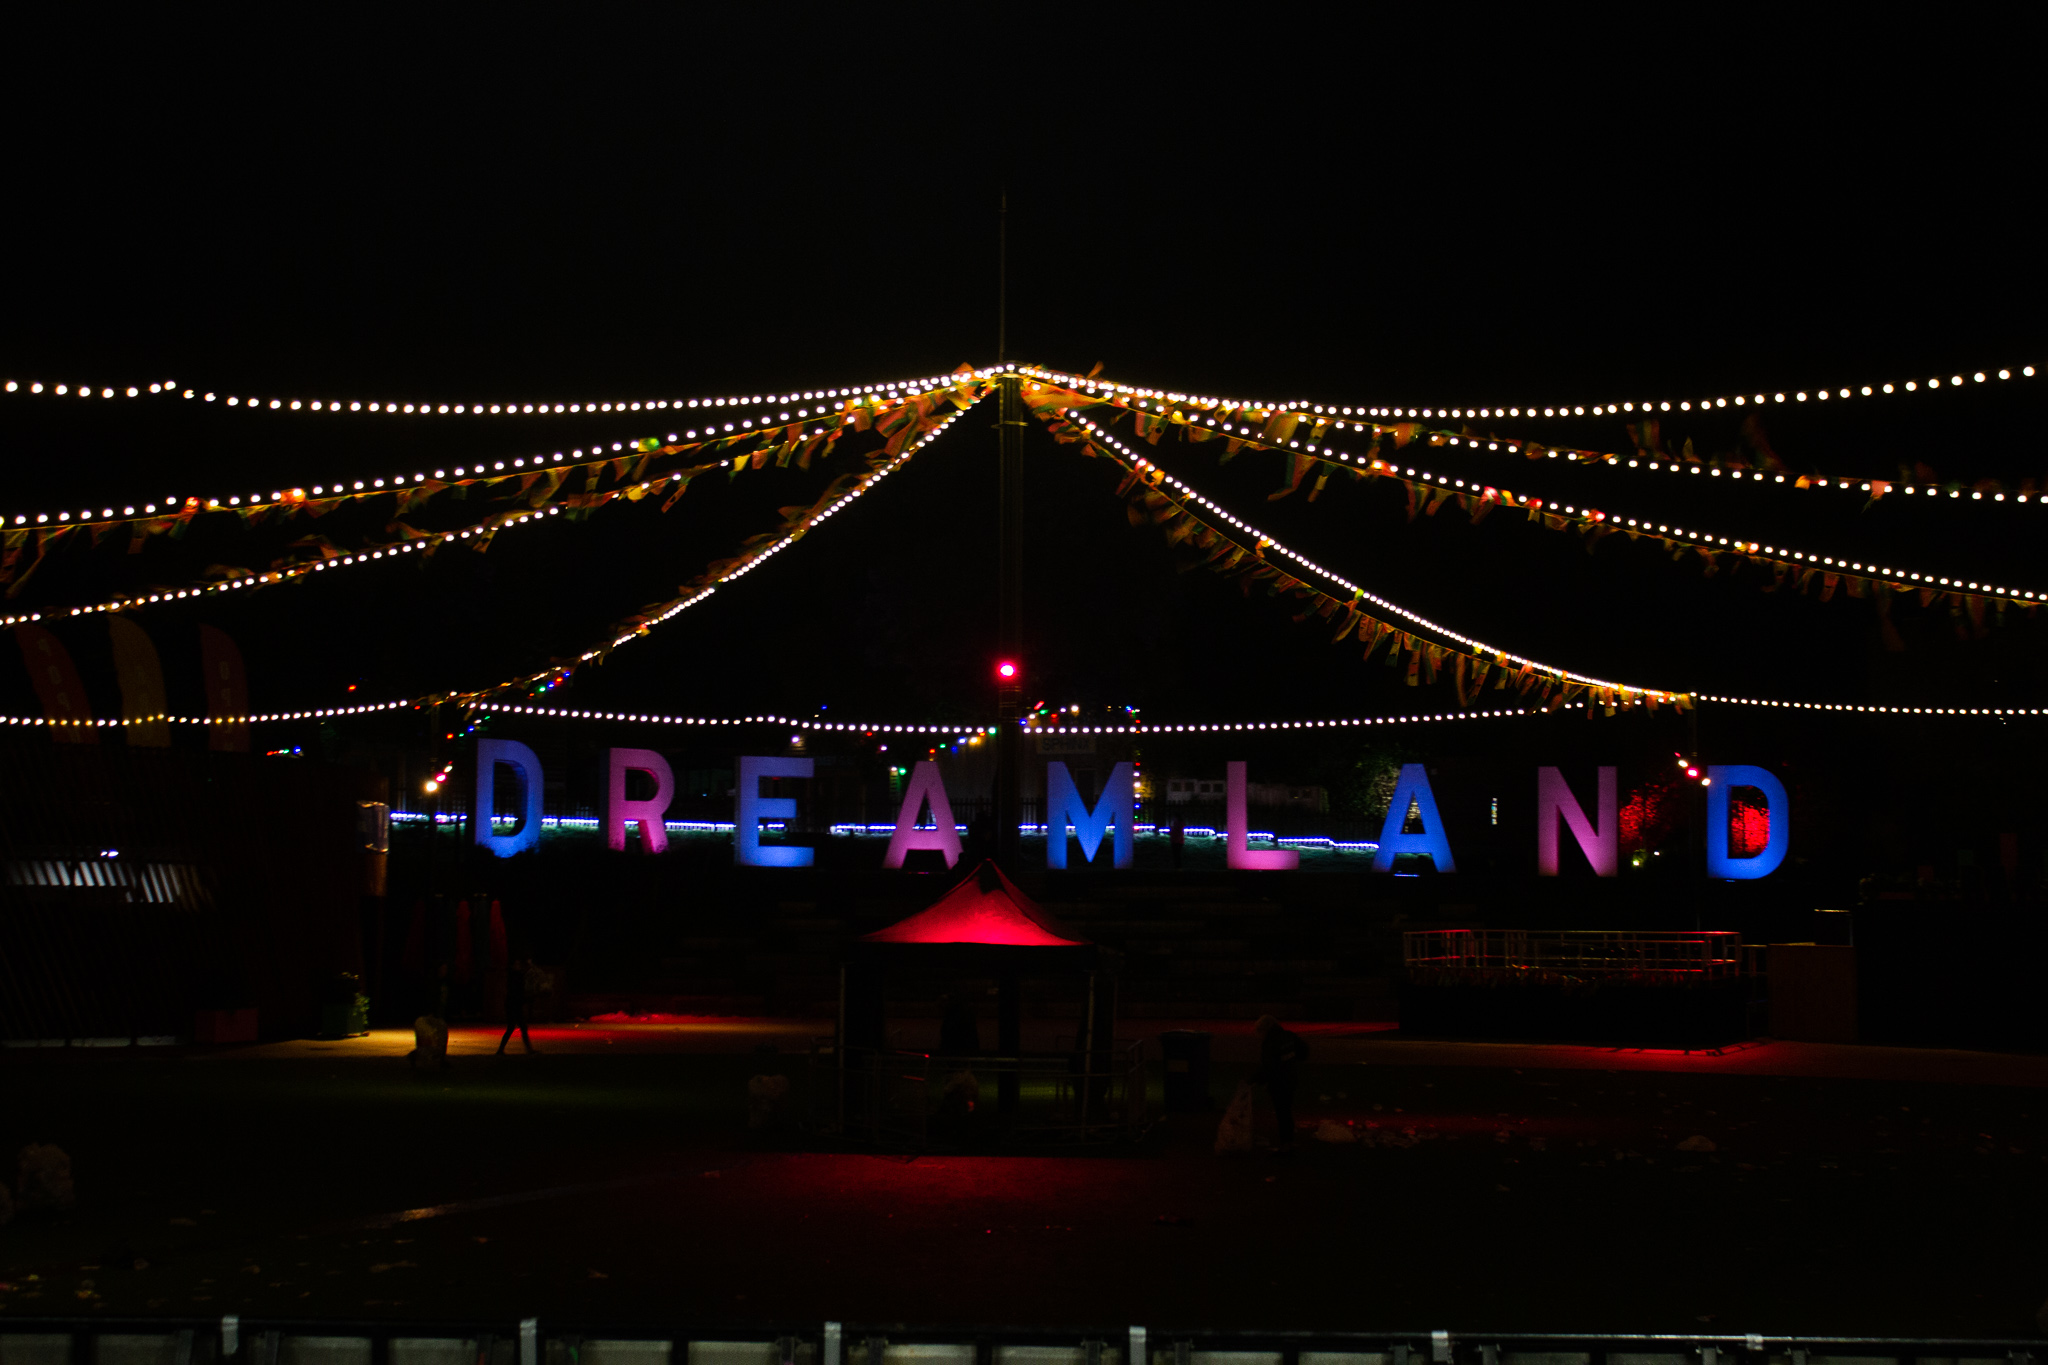 dreamland in brights lights